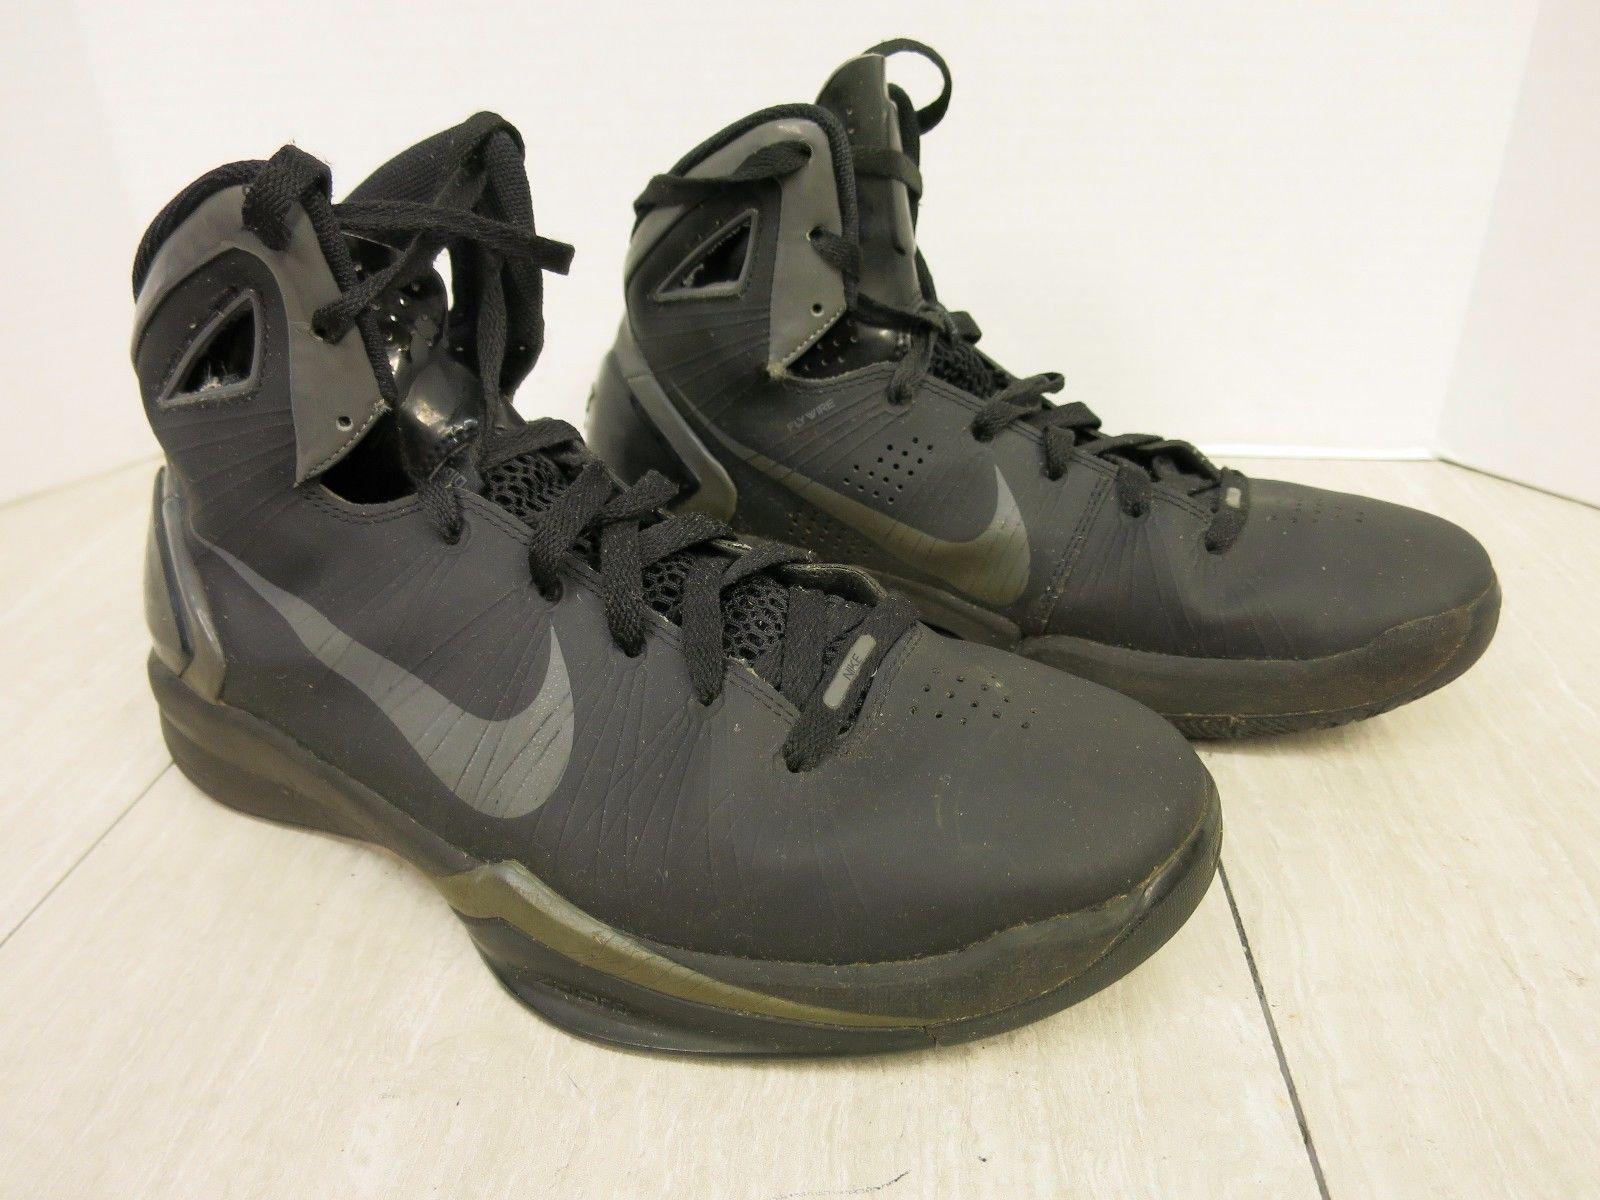 Nike 407525-001 Hyperdunk Basketball Shoes Trashed or Treasured Men's 11 https://t.co/Y9zVYQJa6a https://t.co/8kUPhLrMia